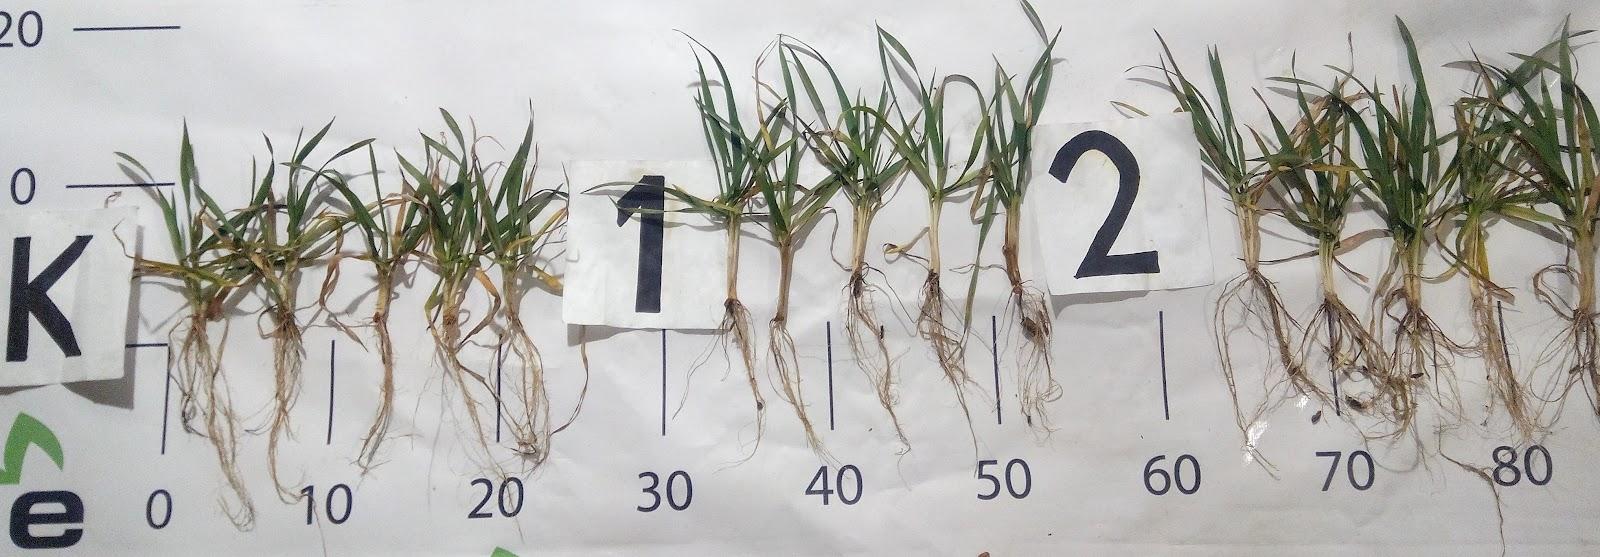 seeds-photo-ecoorganic